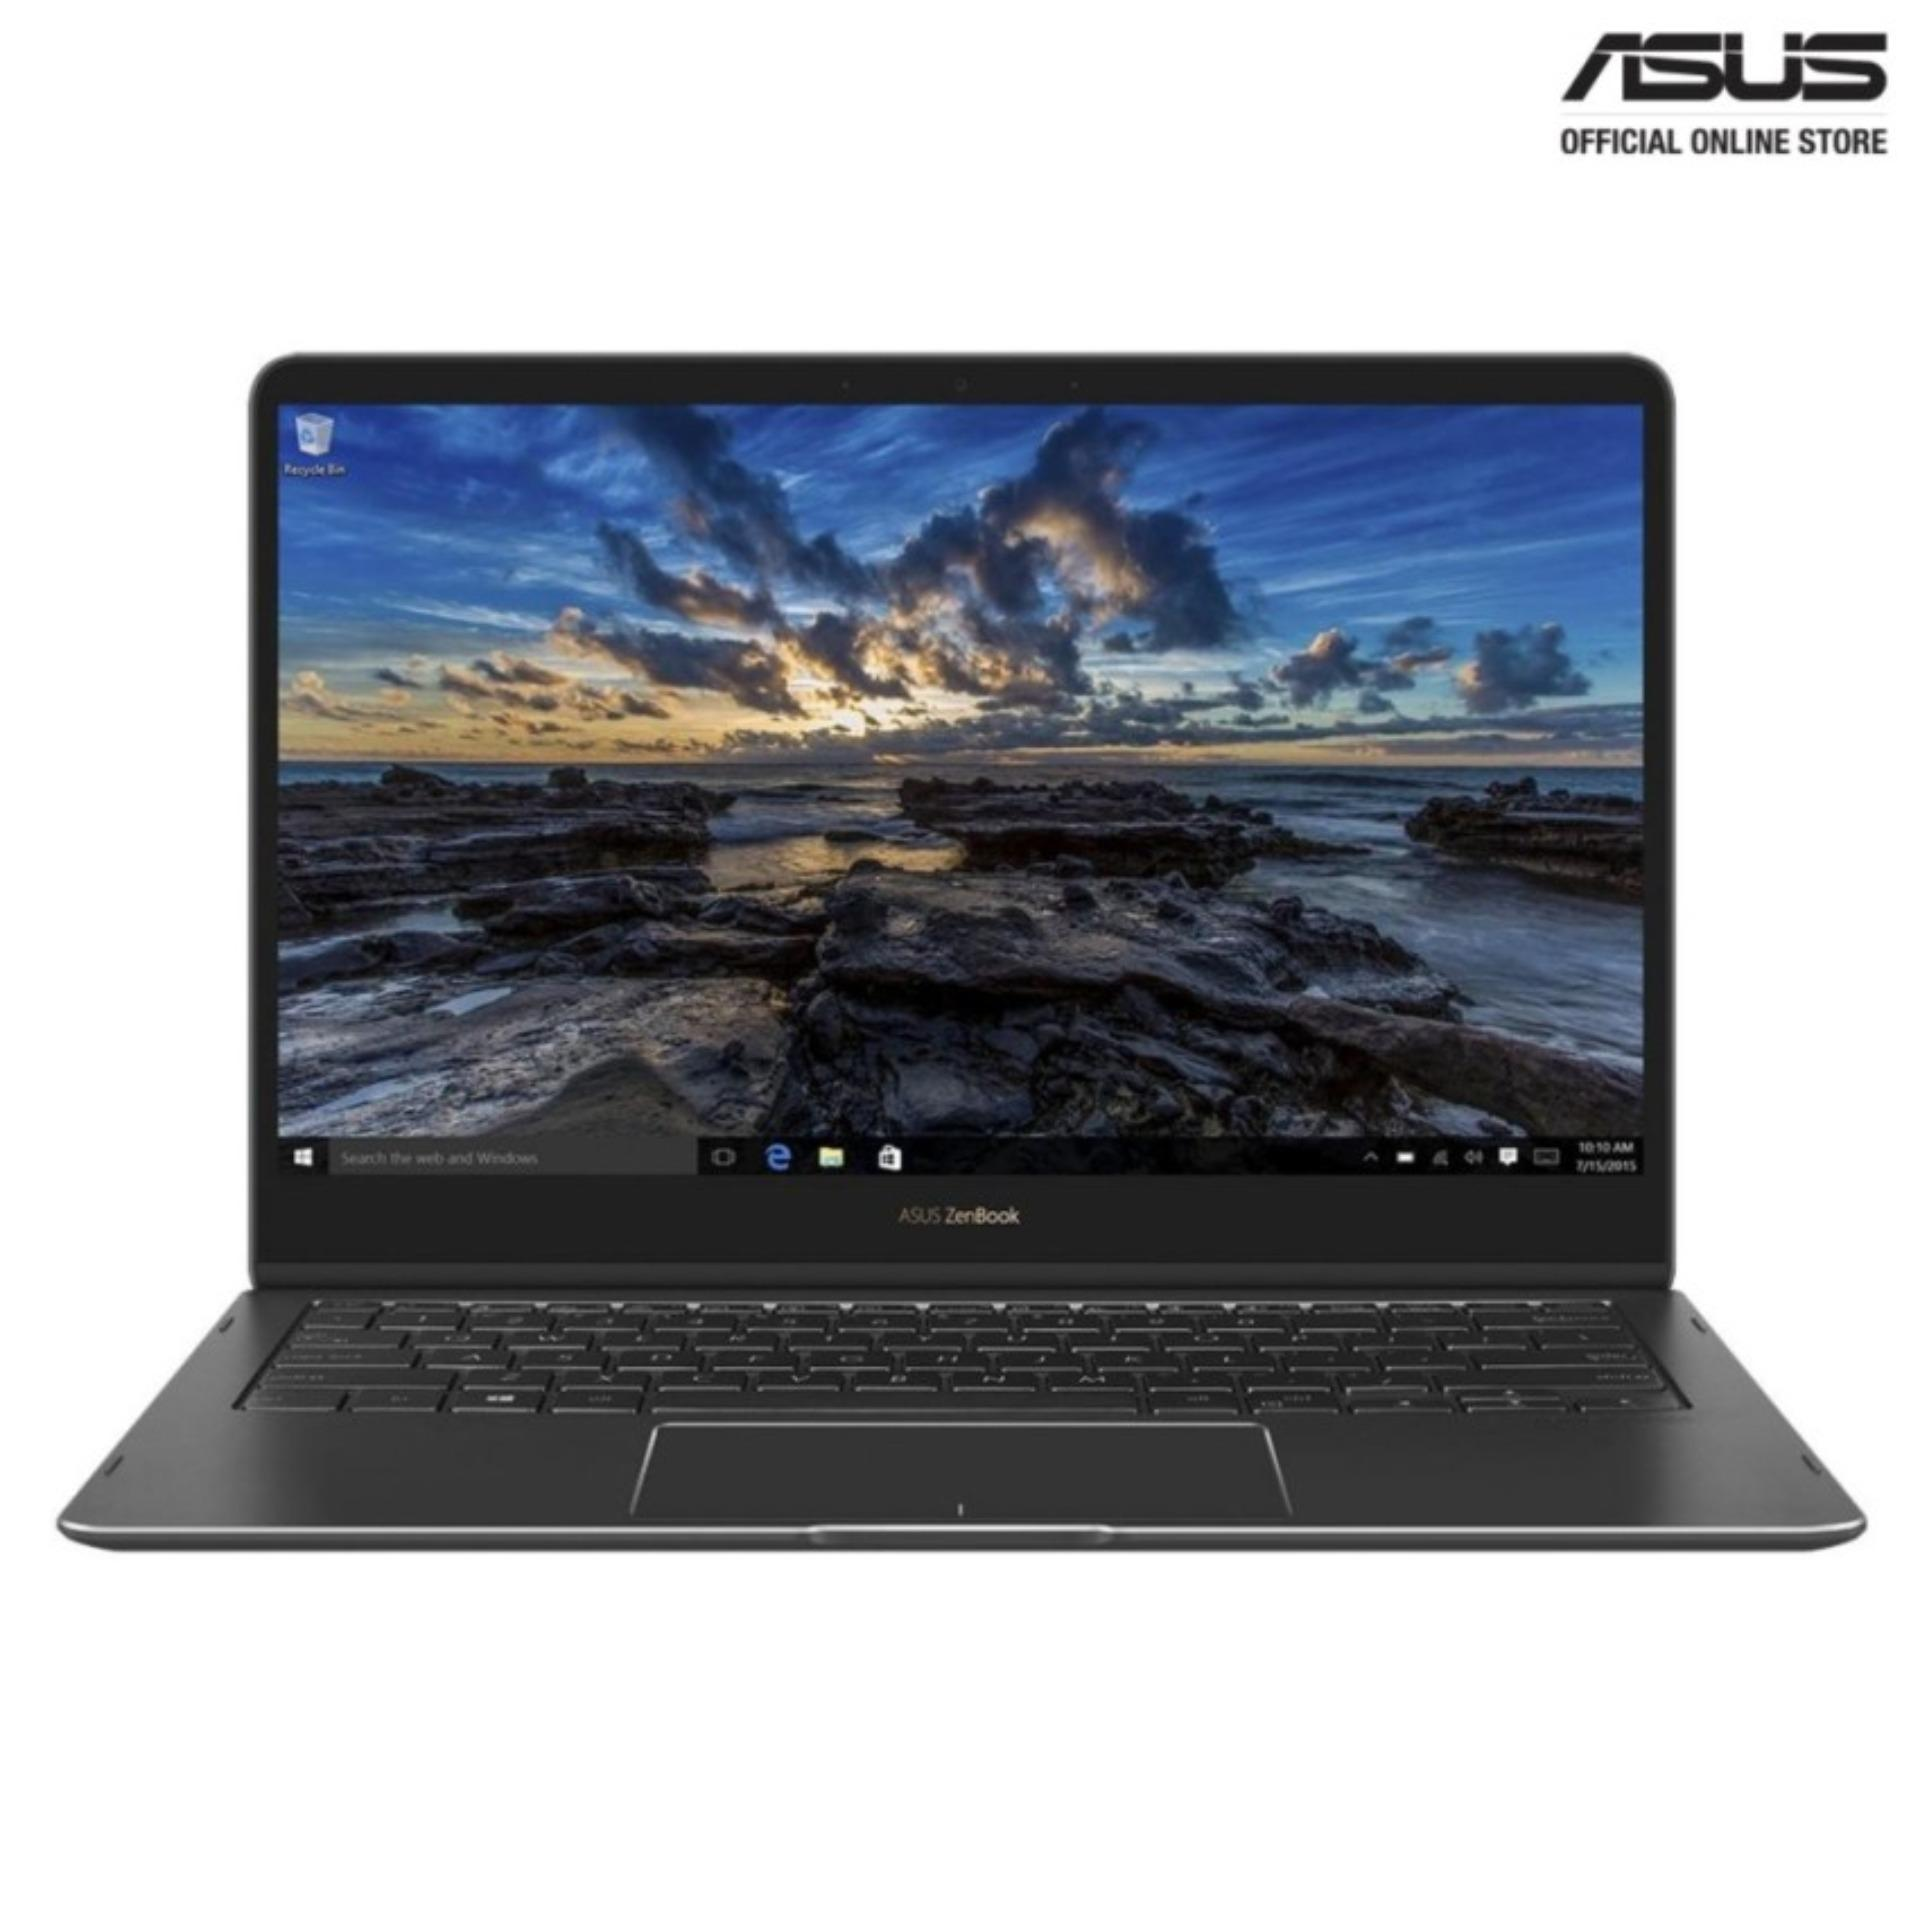 ASUS ZenBook Flip S UX370UA -C4202T (Smoky Grey) 13.3 IN INTEL CORE I7-8550U 16GB 512GB SSD WIN 10